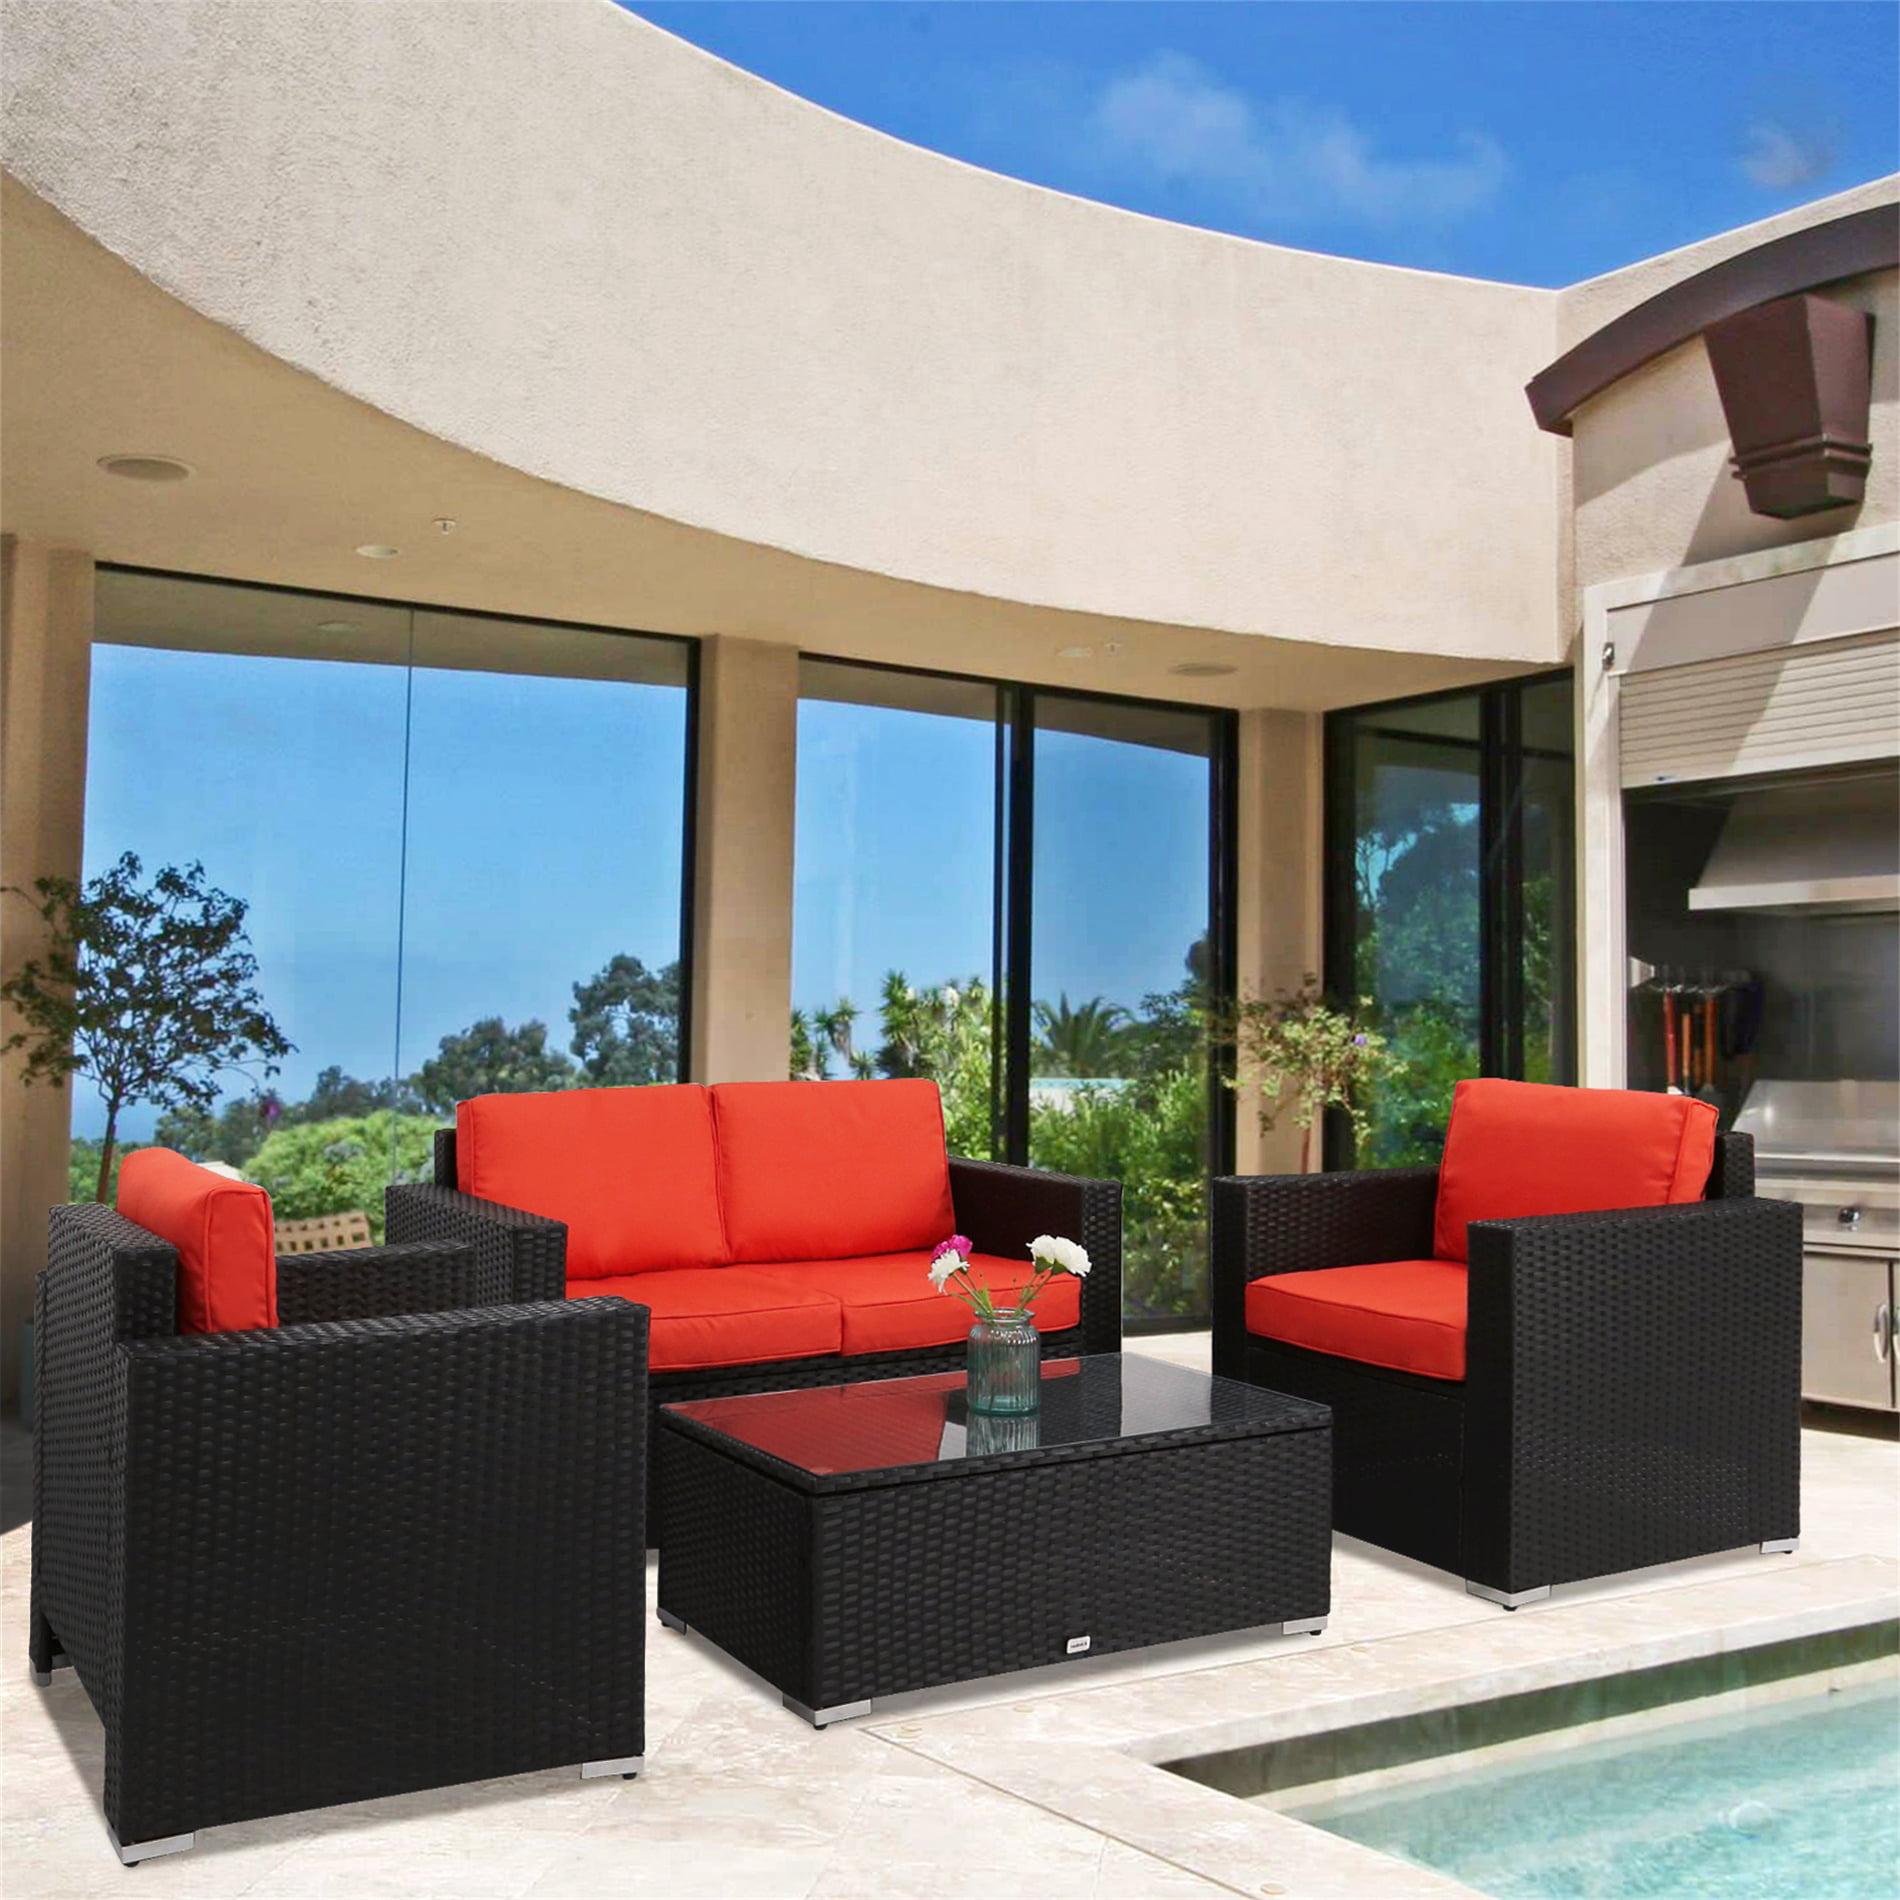 Click here to buy Kinbor 4pcs Outdoor Patio Furniture Pe Wicker Rattan Sofa Sectional Set Orange.